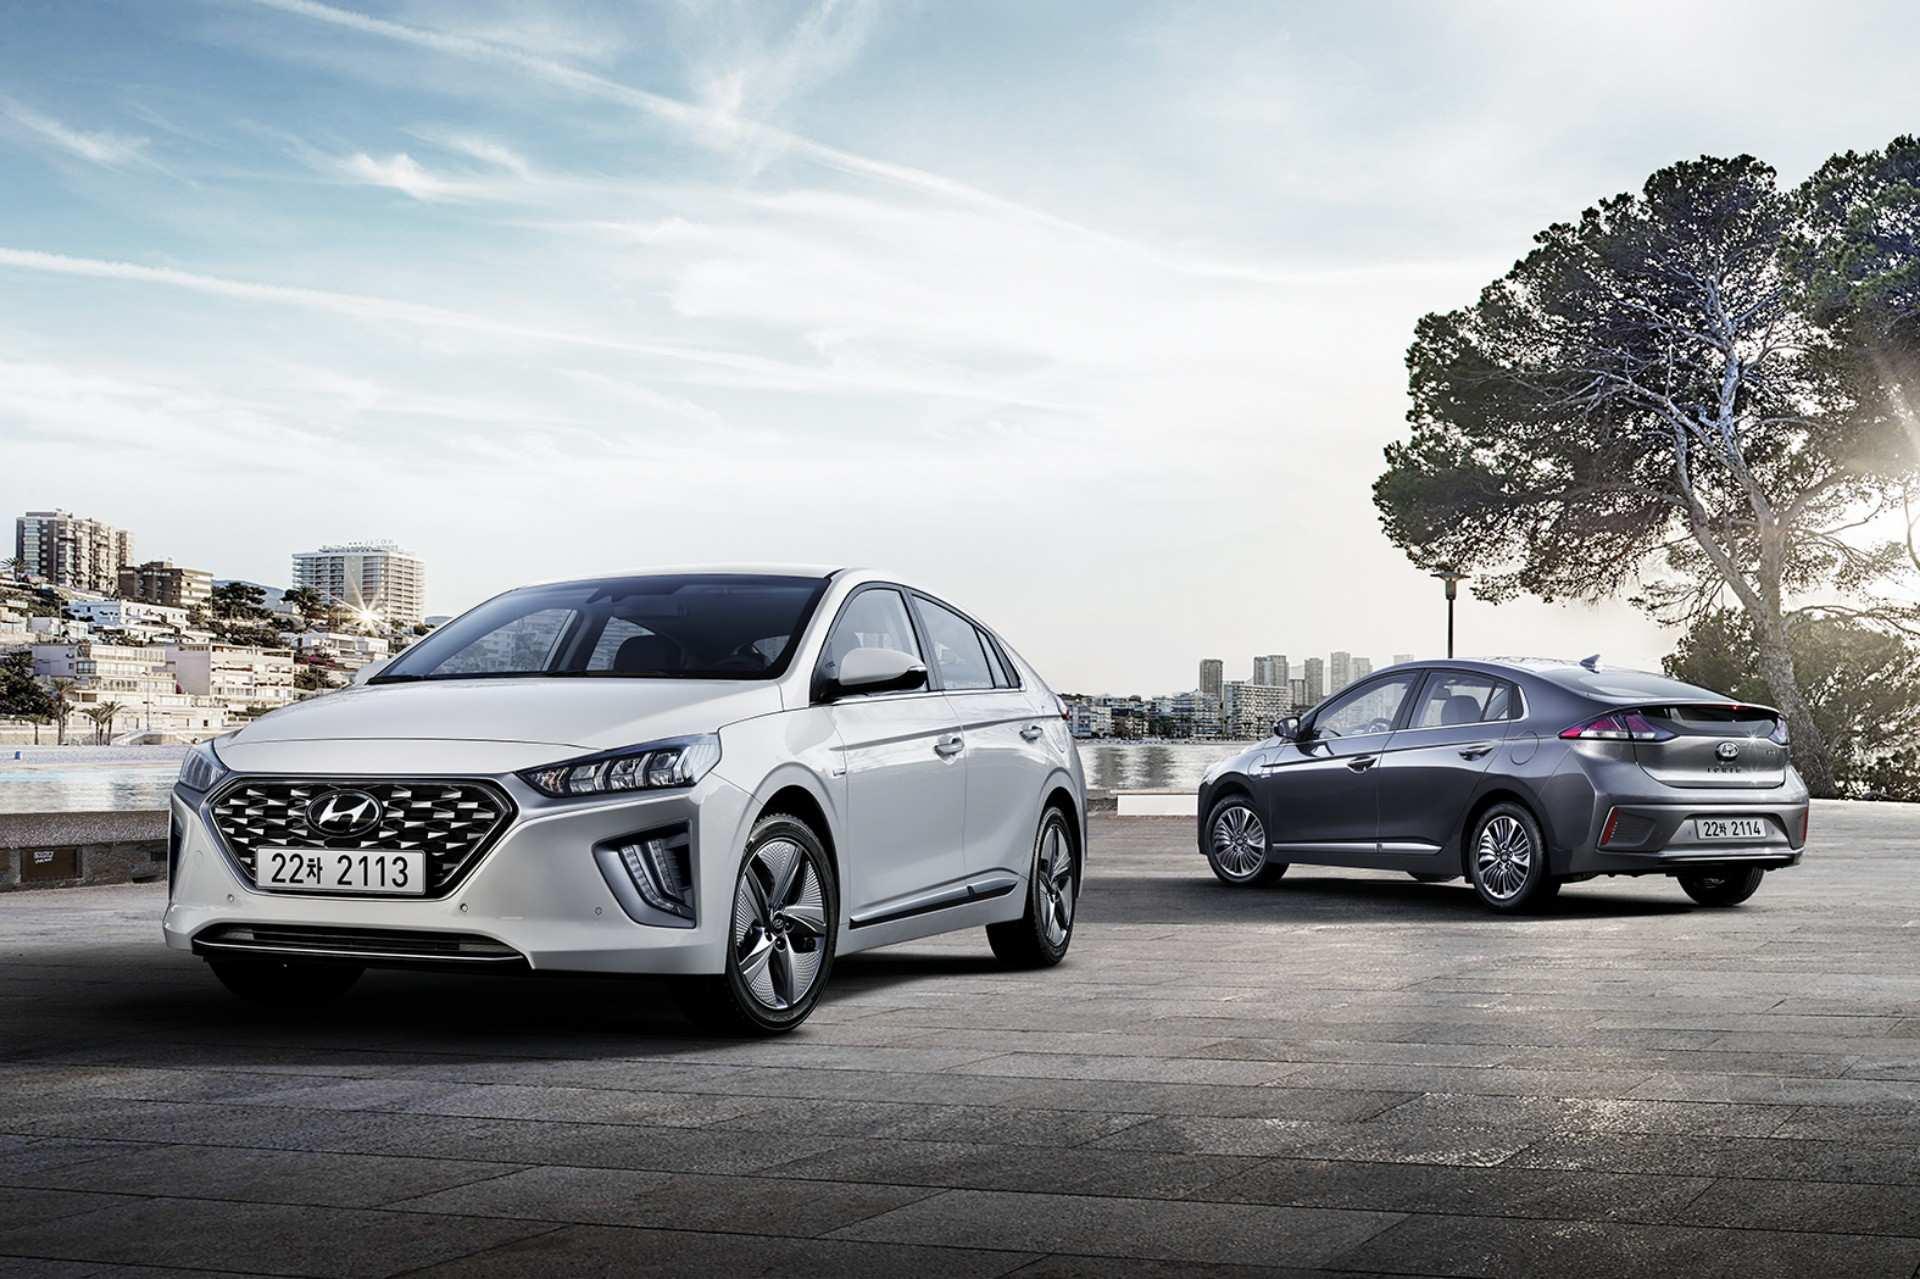 95 Best Review Hyundai Lineup 2020 Images for Hyundai Lineup 2020